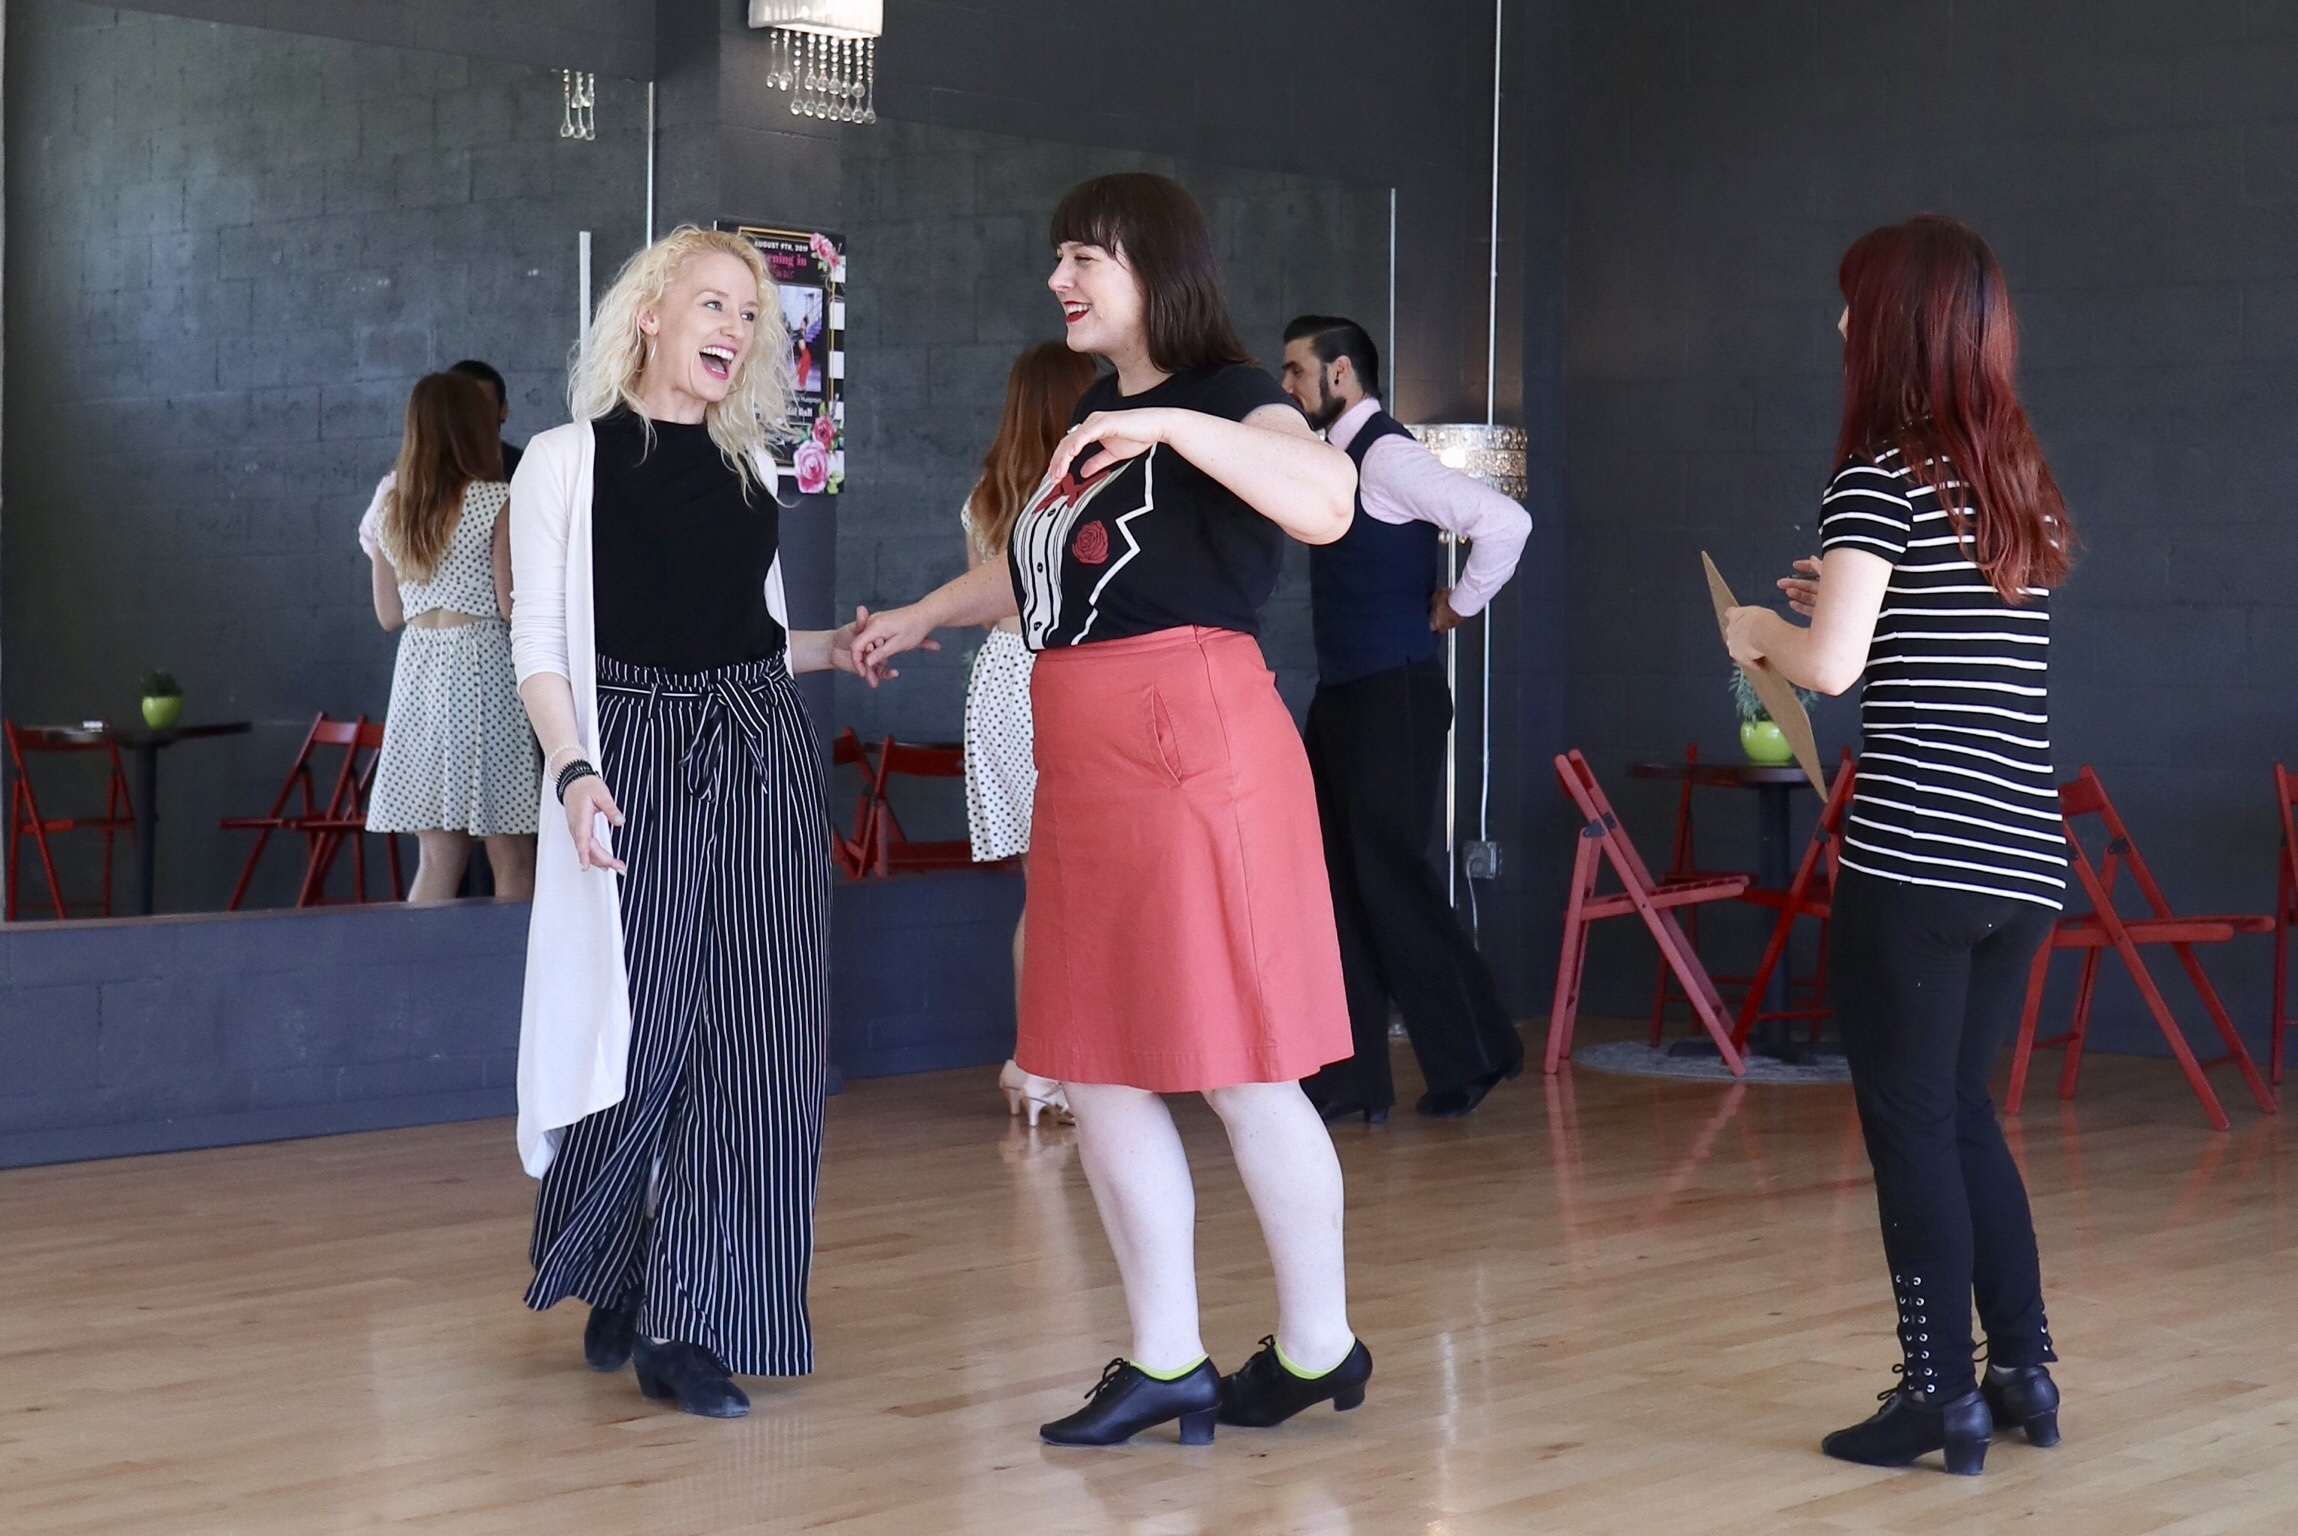 Dani Atkins (Pro. Dance Competitor & Coach) Emily Evans (Dance Instructor) & Allison Fox (Student)